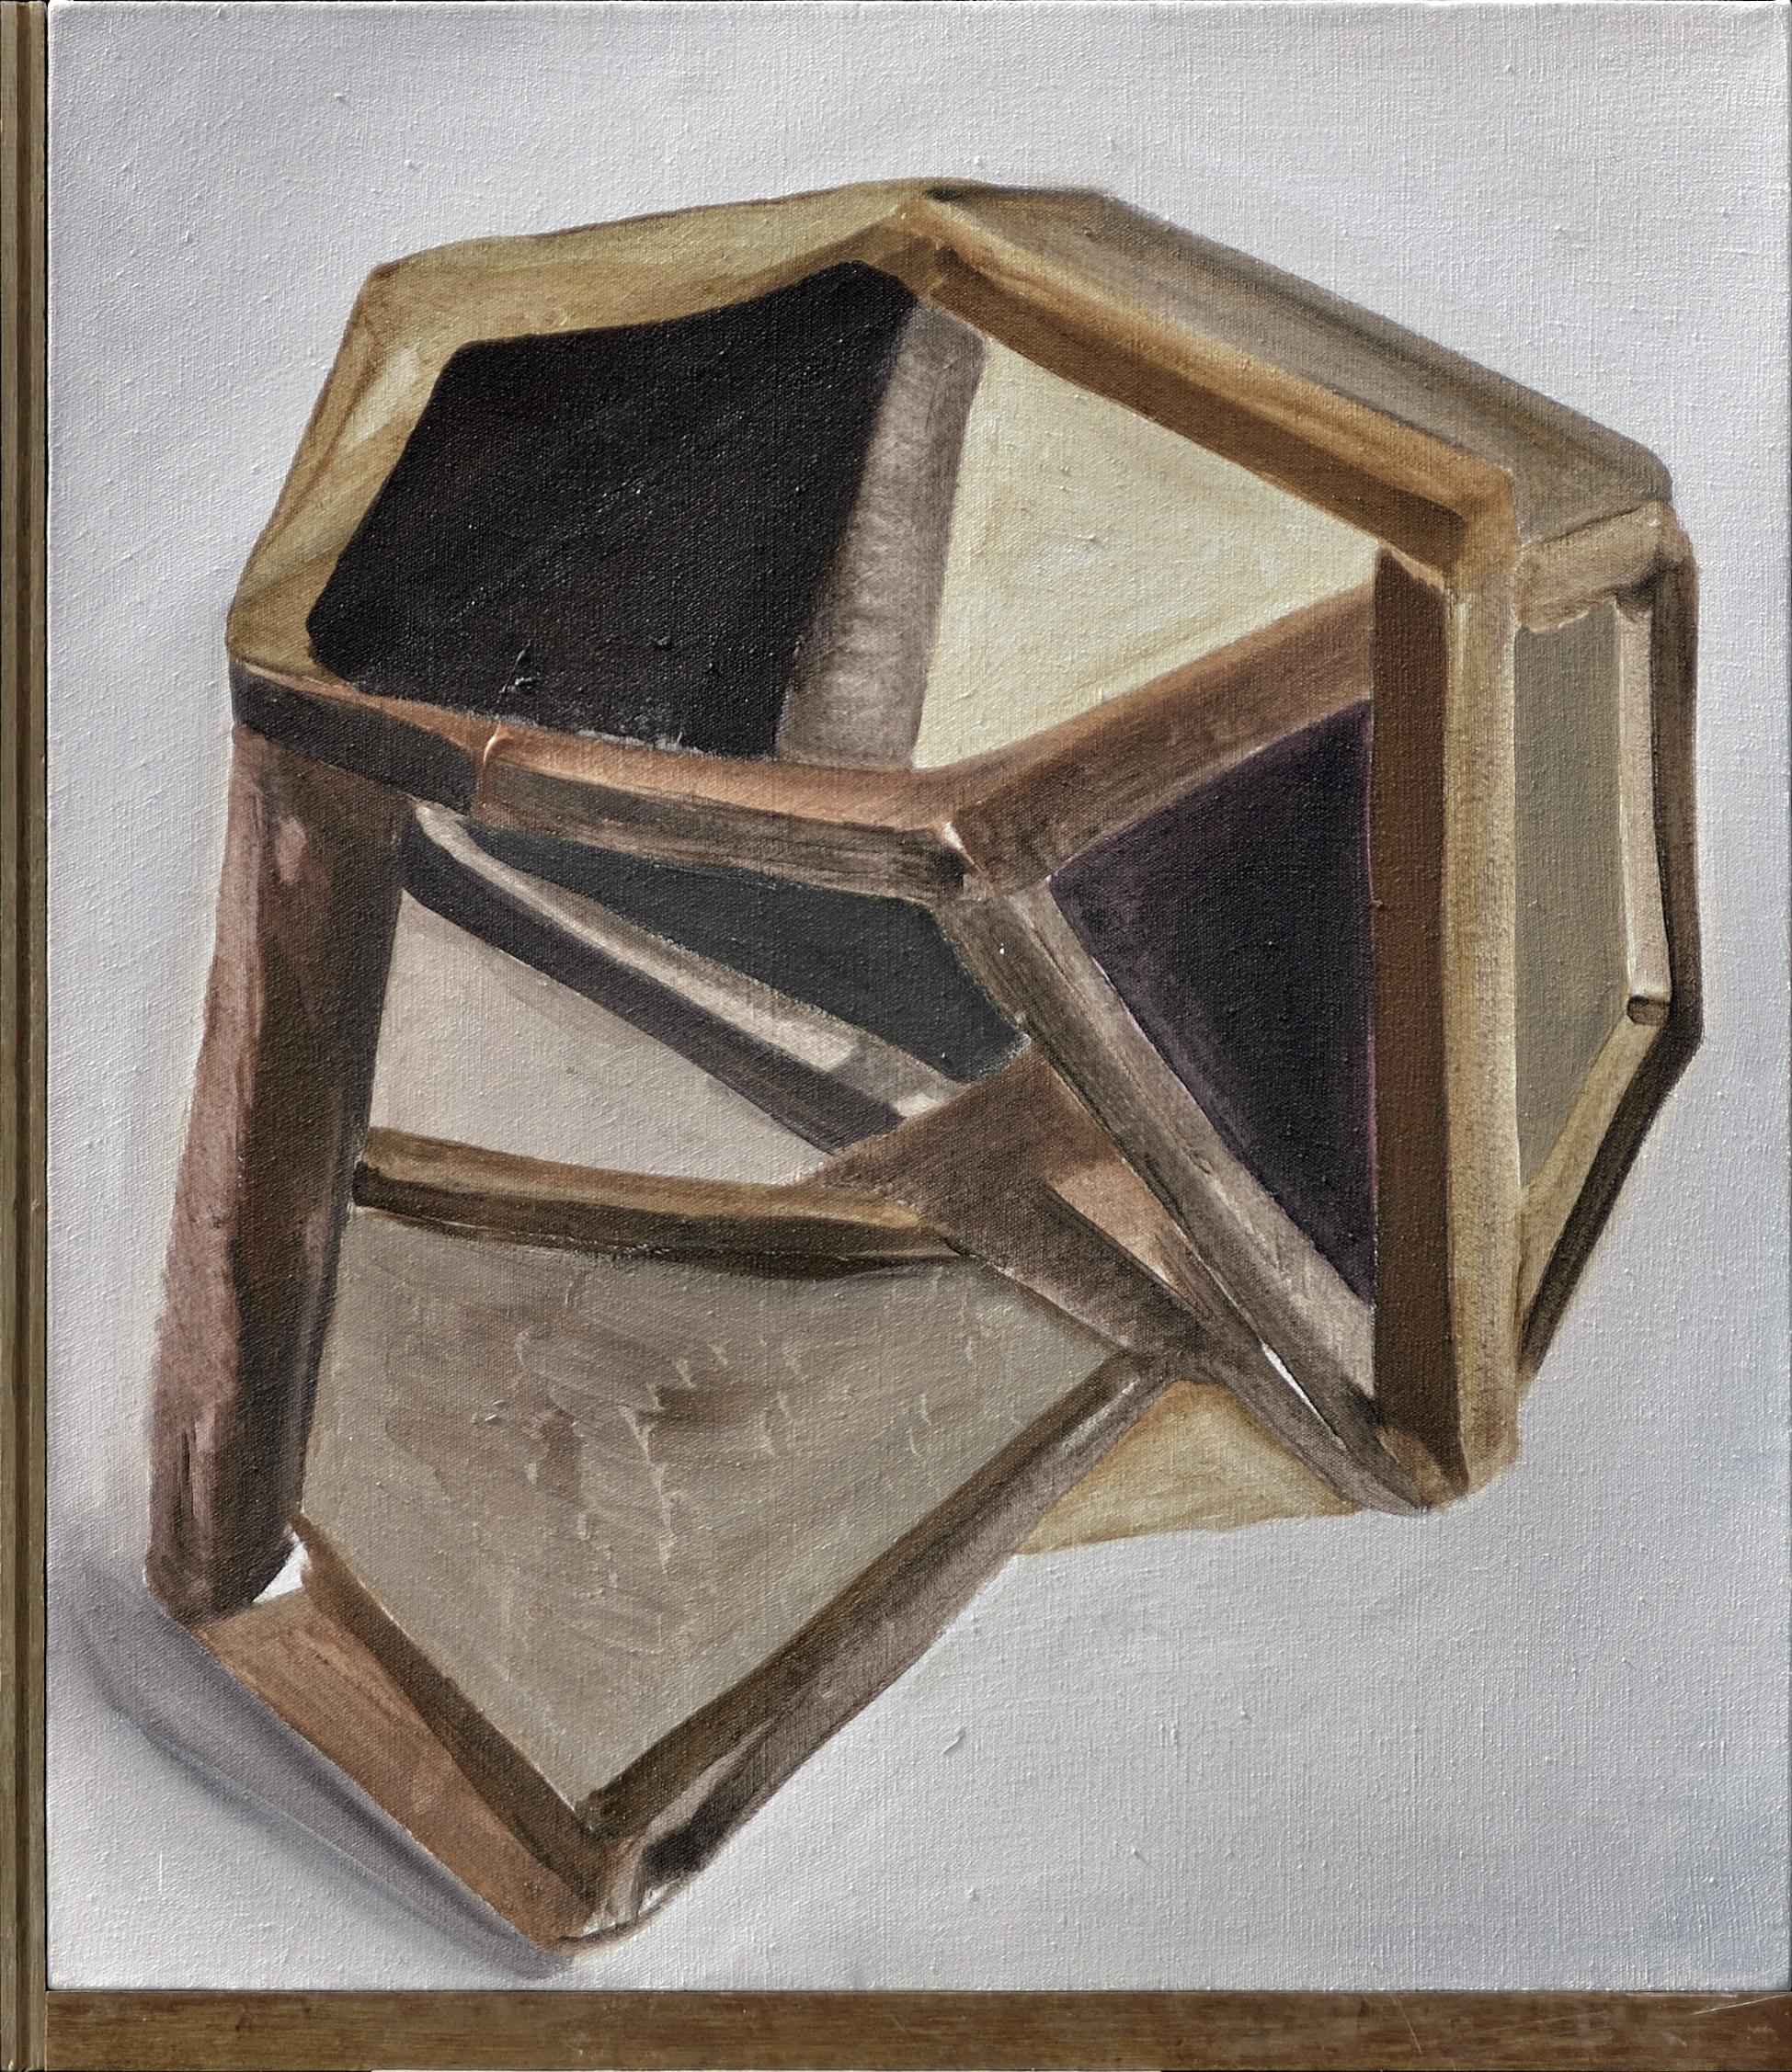 Chen Yujun 陈彧君, A State of Similarity 5566 相似物5566, 2014, Acrylic on canvas, wooden floor 布面丙烯, 木地板, 83.5 x 72 cm